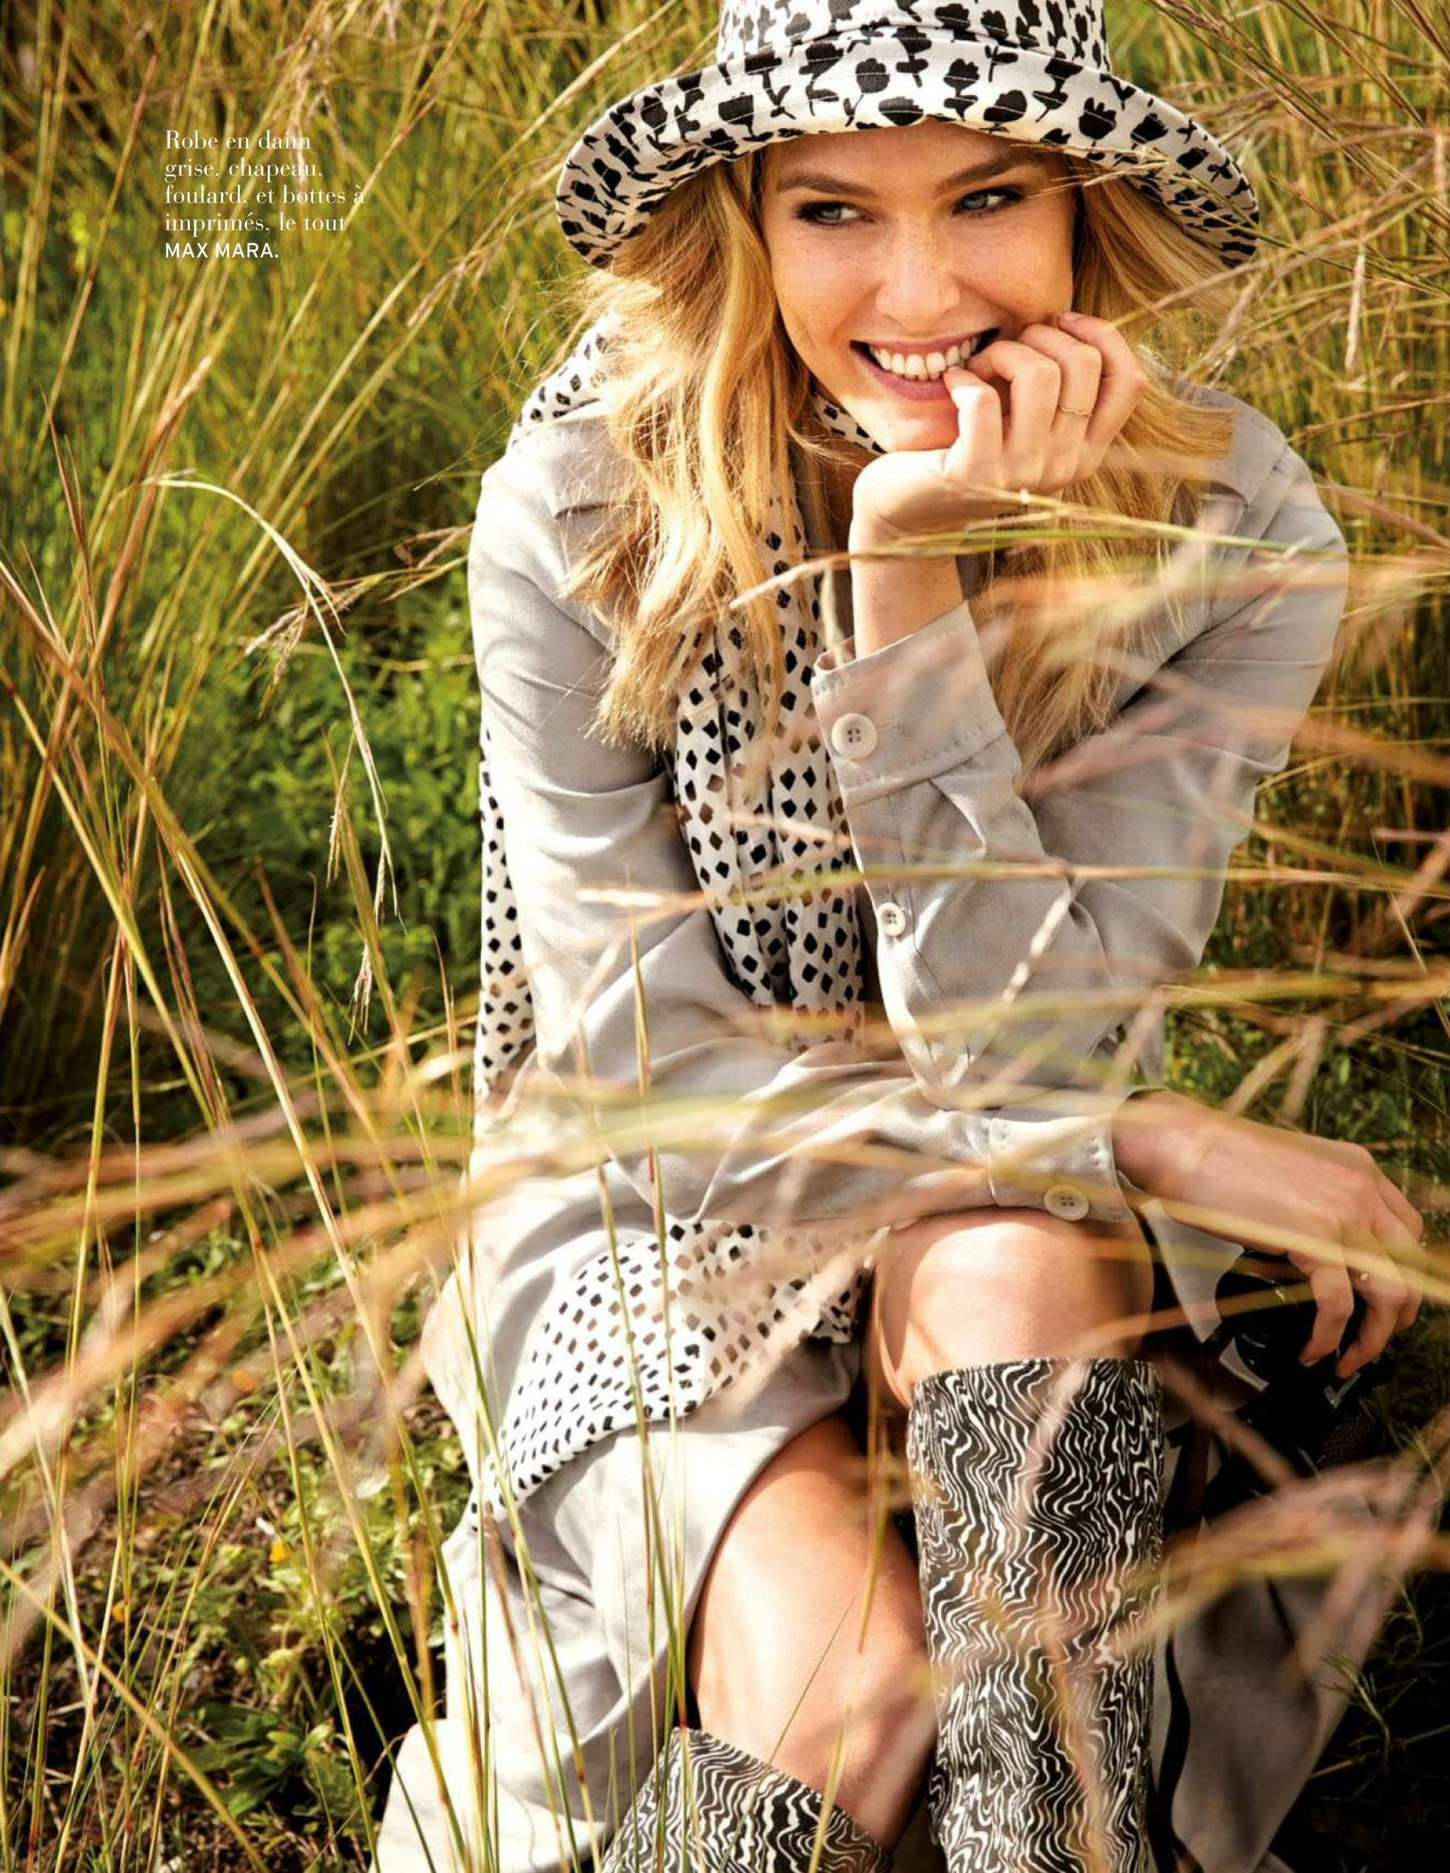 Bar Refaeli - Elle Magazine Spain May 2012 Issue | Just